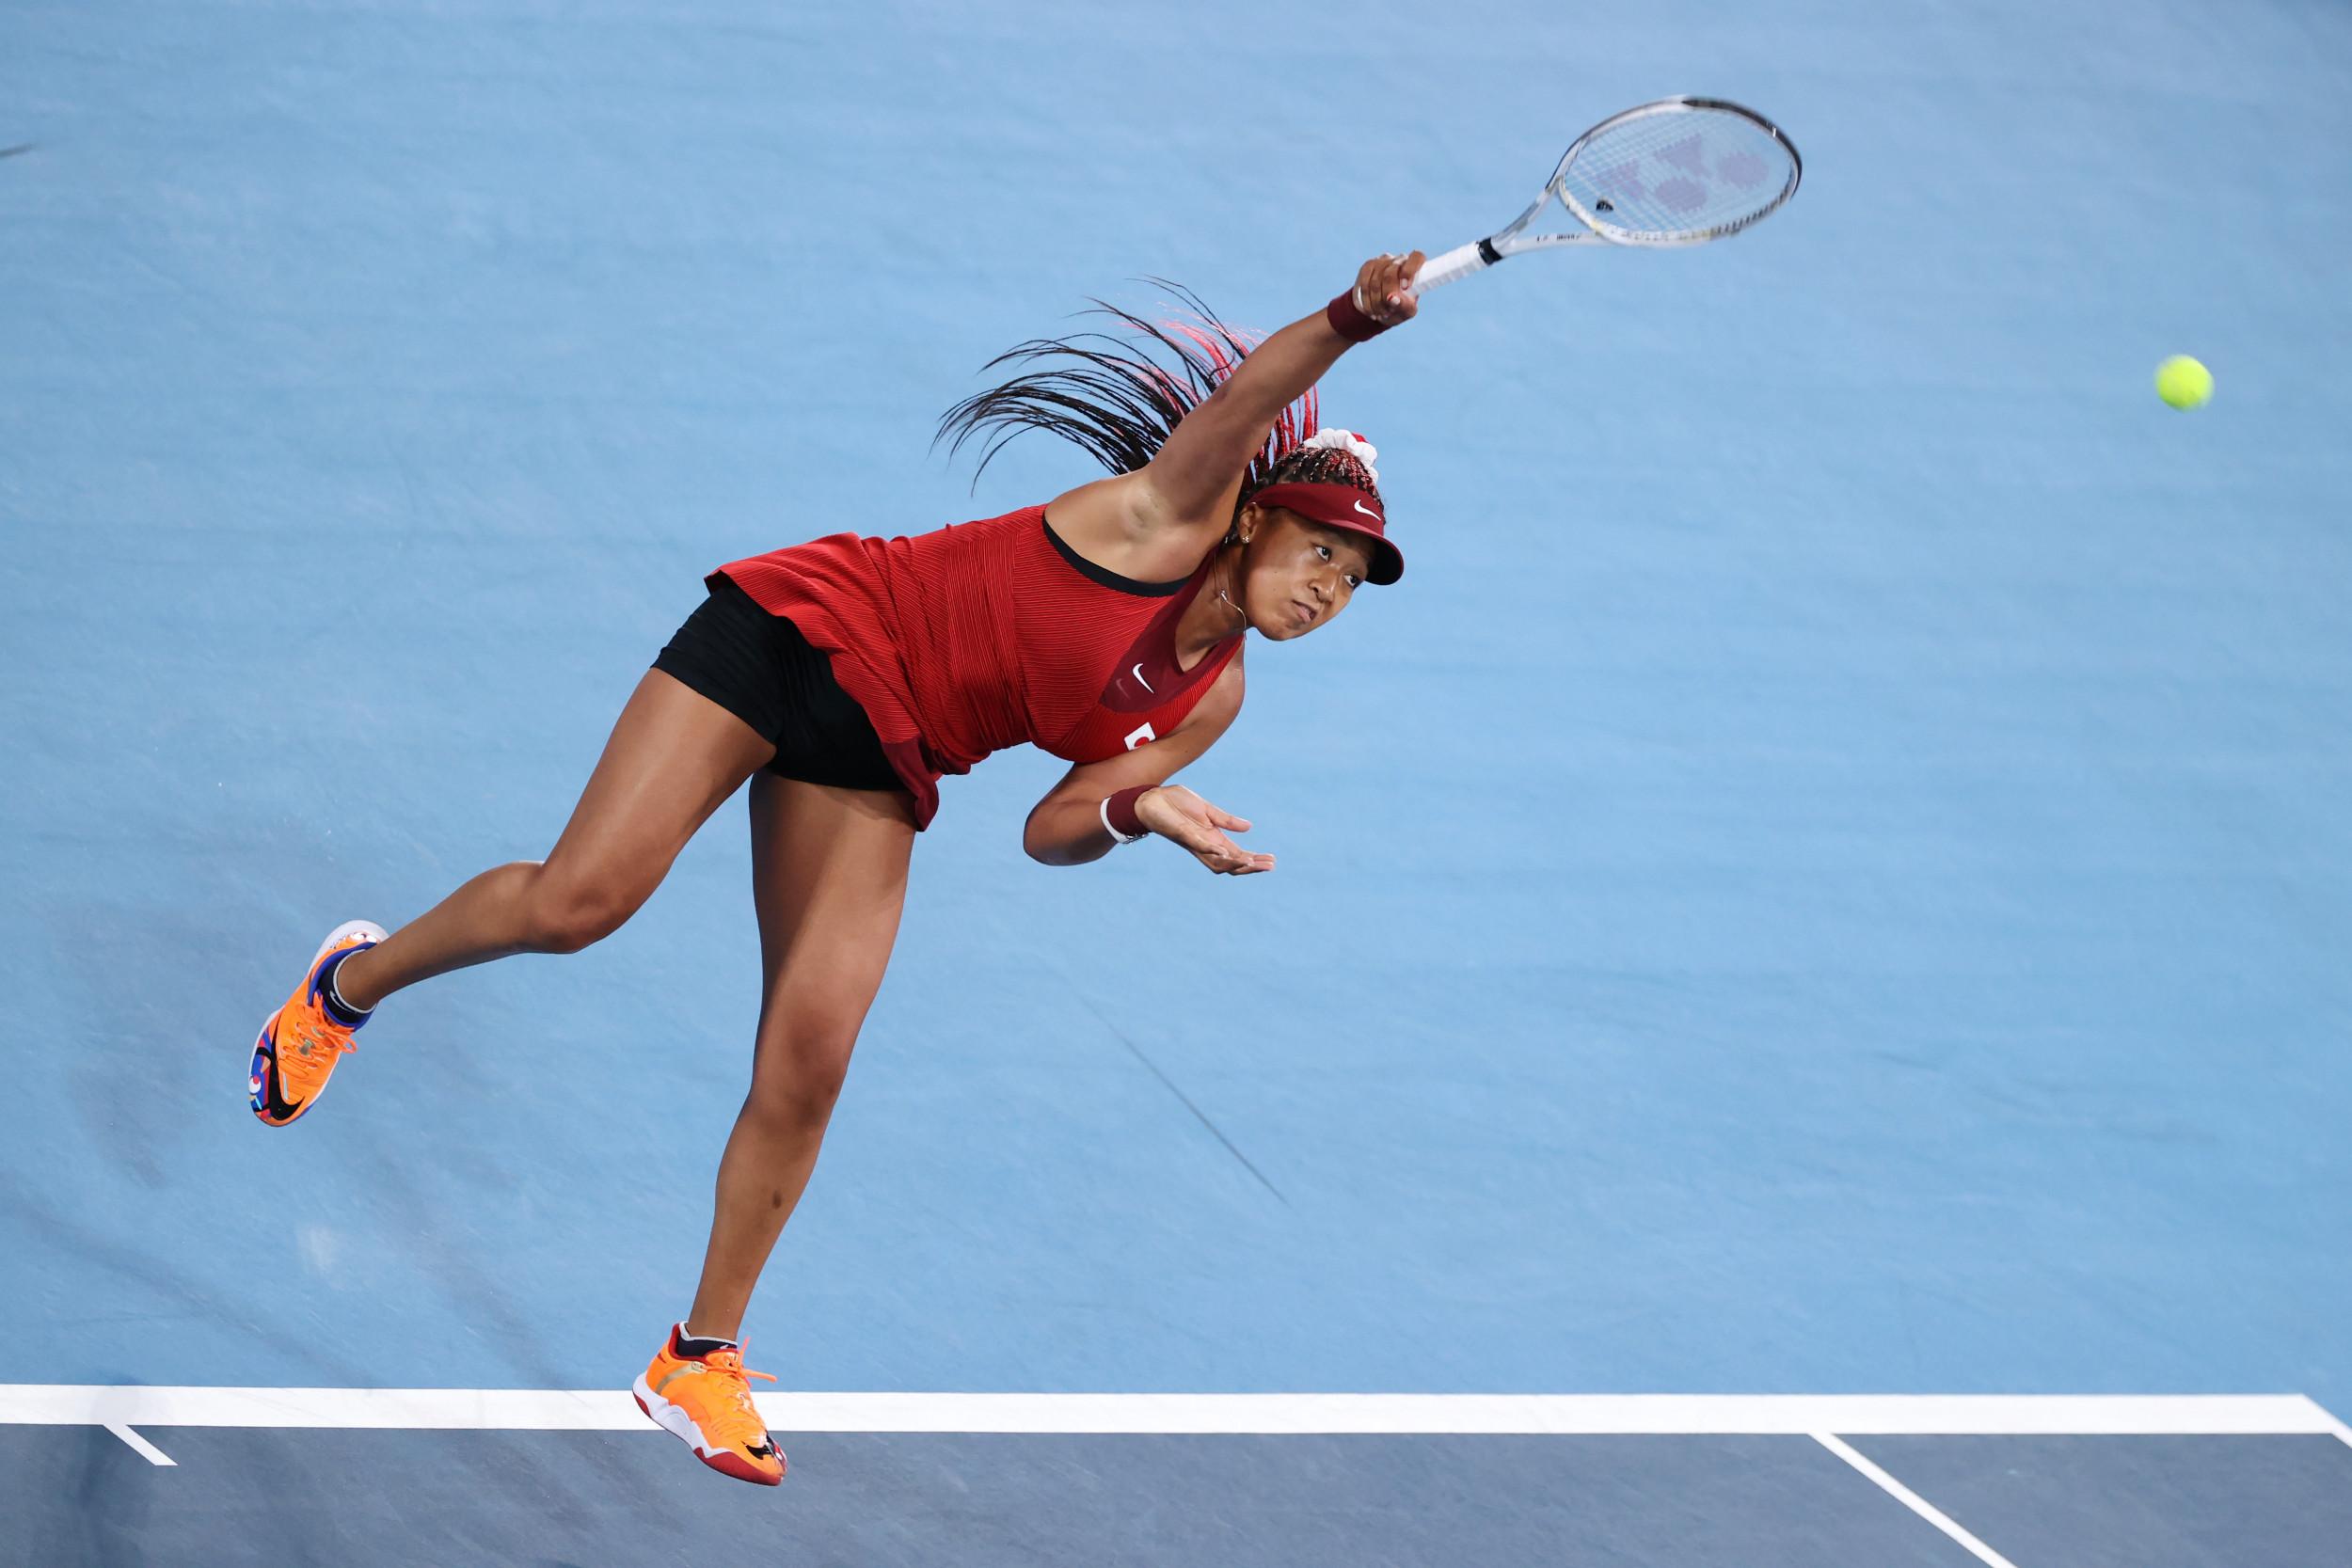 Naomi Osaka Says Olympic Loss 'Sucks More Than Others'